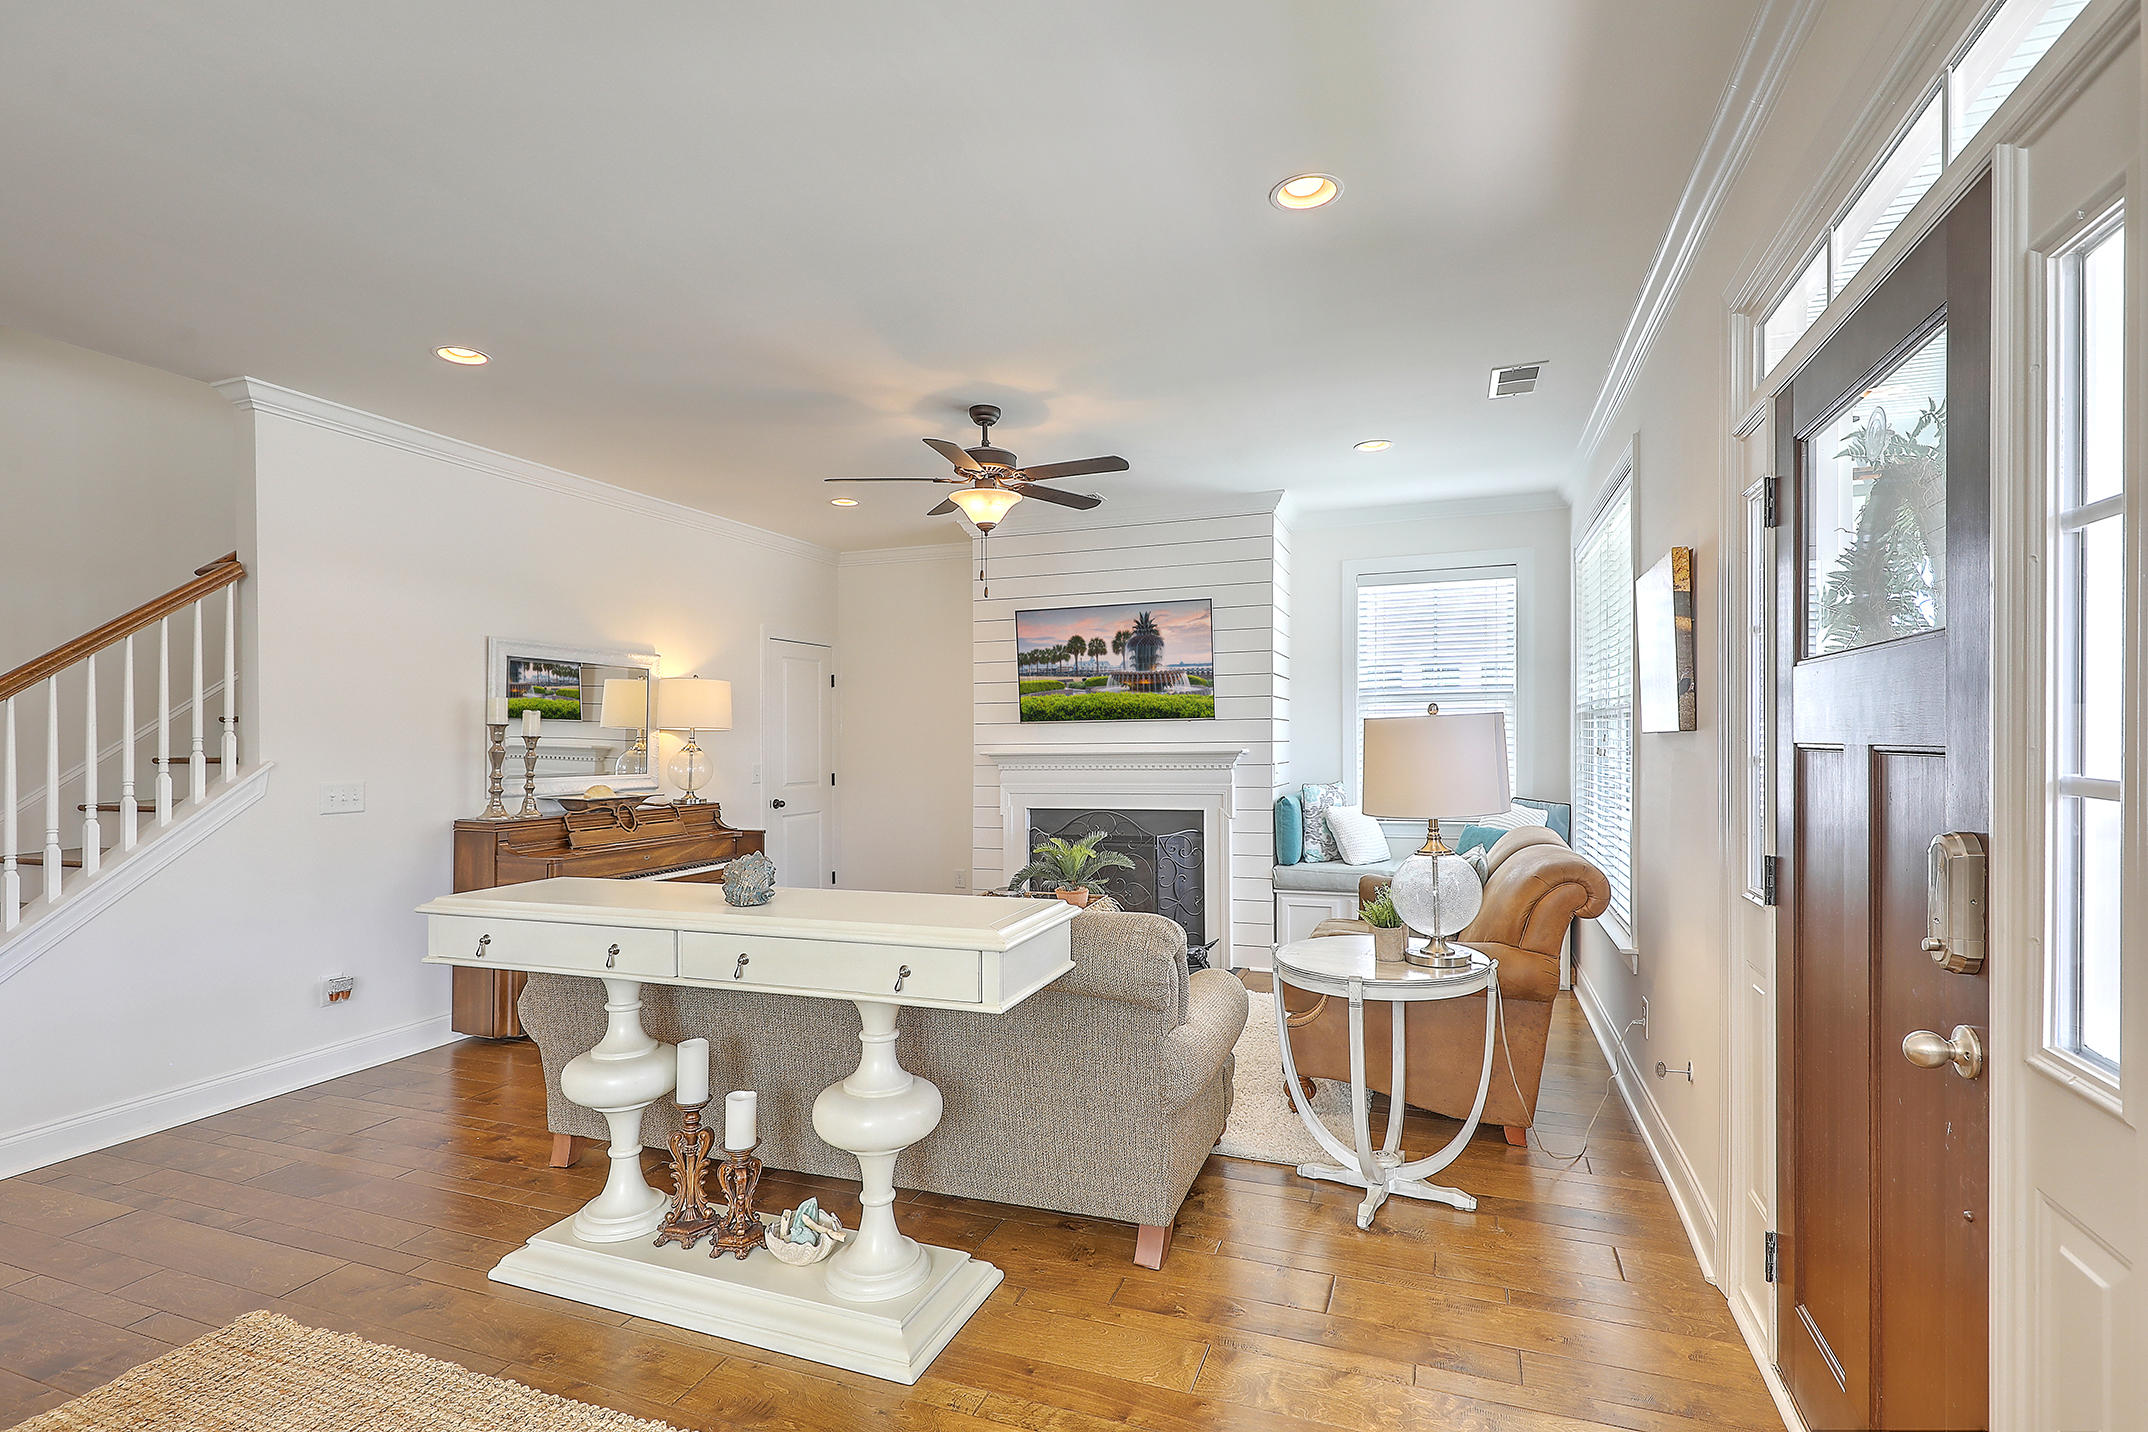 Park West Homes For Sale - 3412 Salterbeck, Mount Pleasant, SC - 6